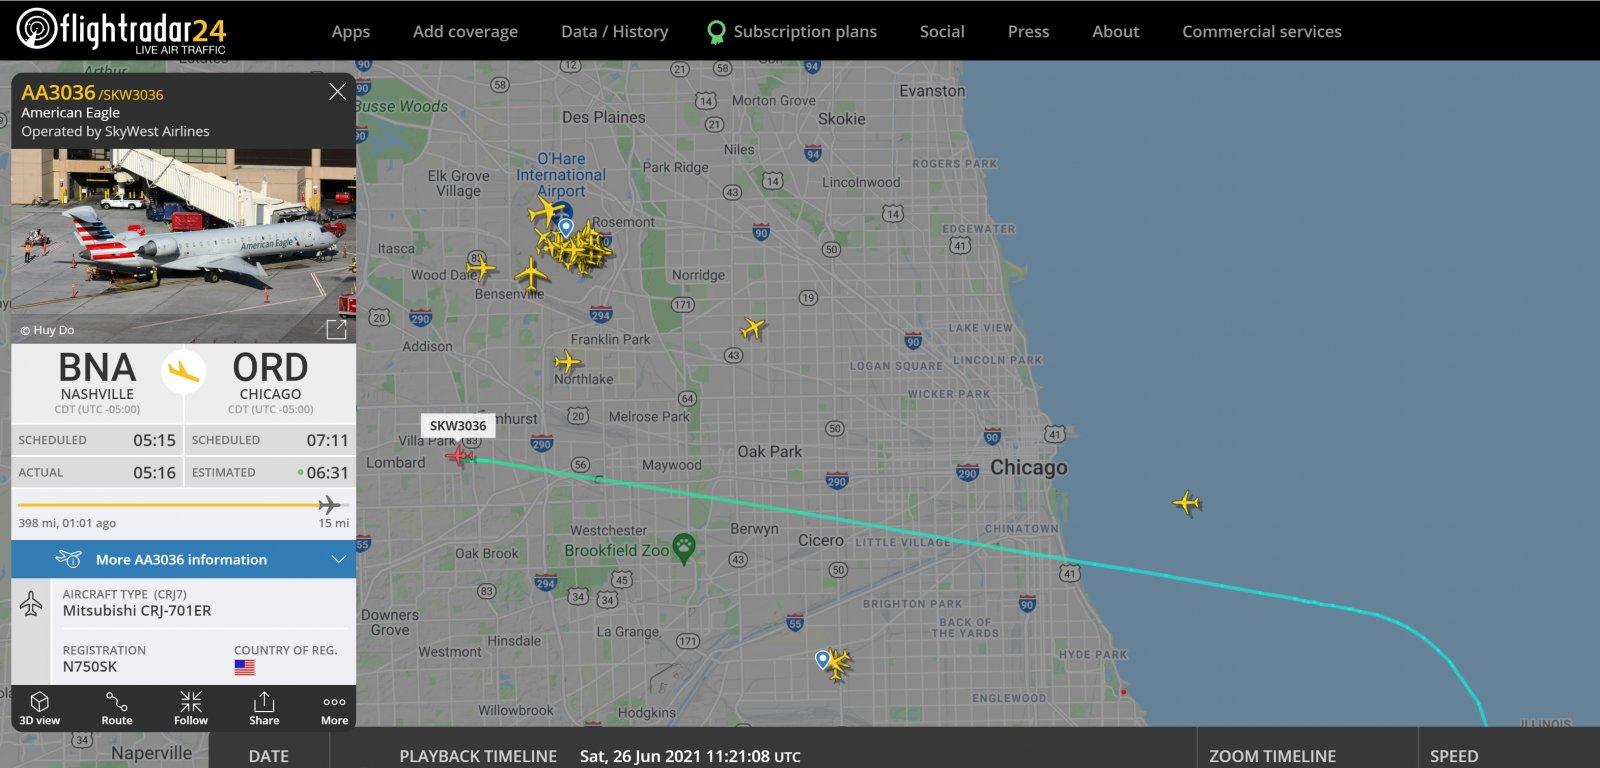 ohare flight 1121 utc.jpg